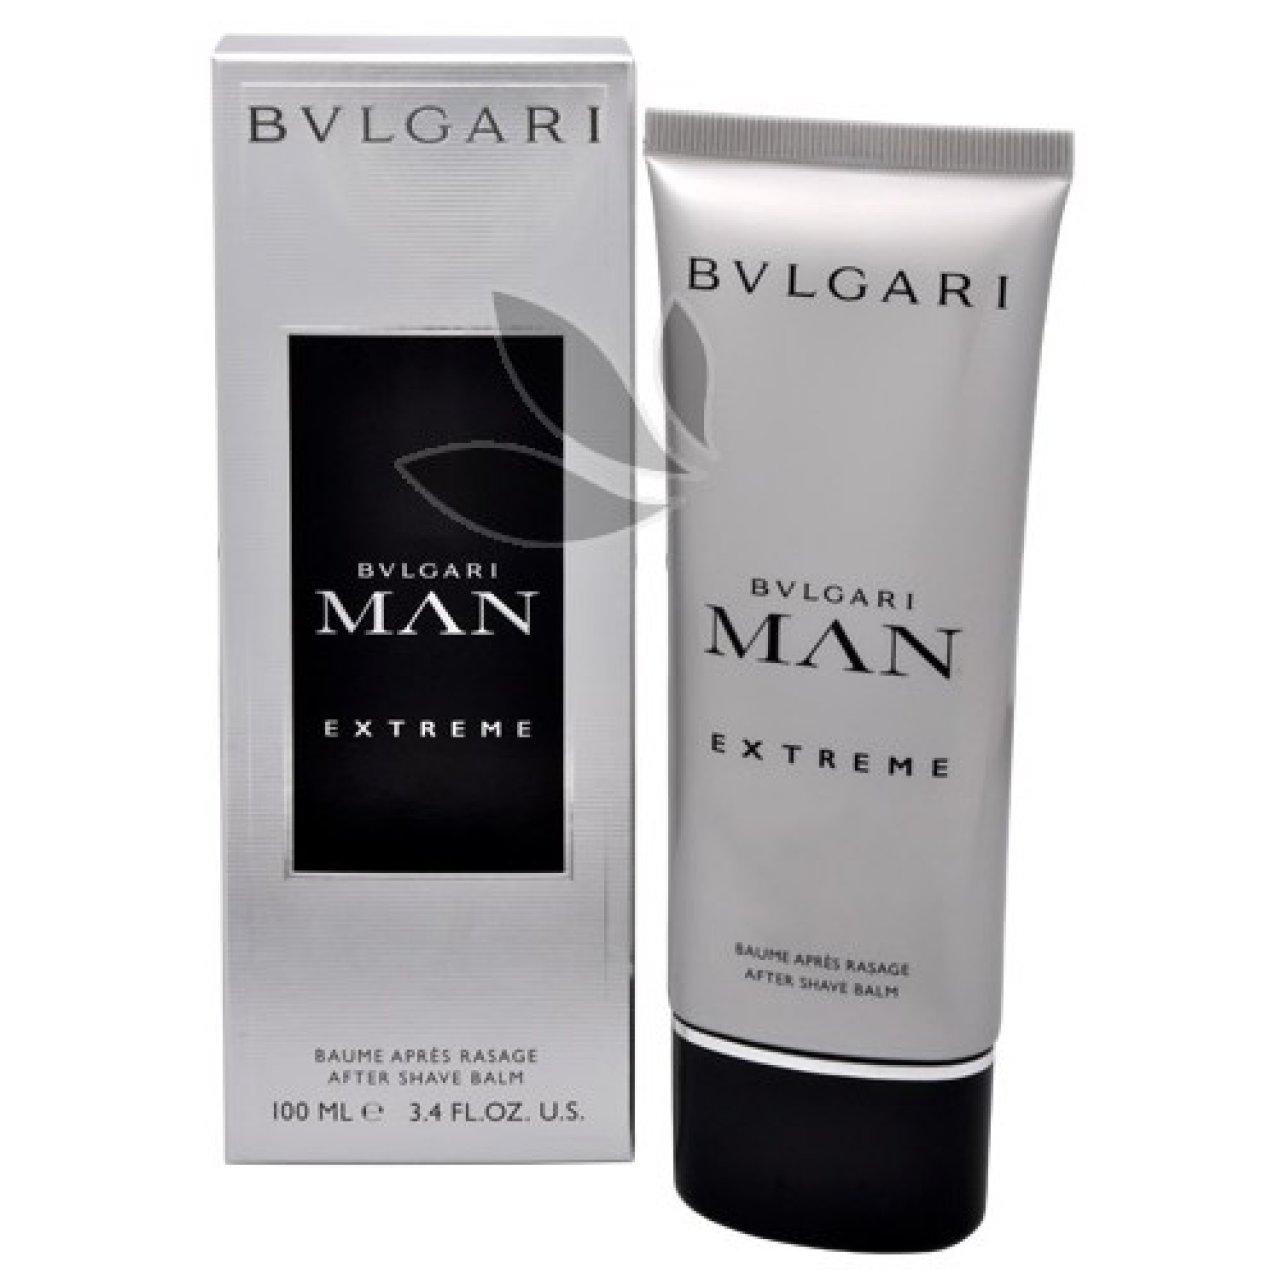 Bvlgari Man Extreme Balz 225 M Po Holen 237 100 Ml Parfemy123 Cz